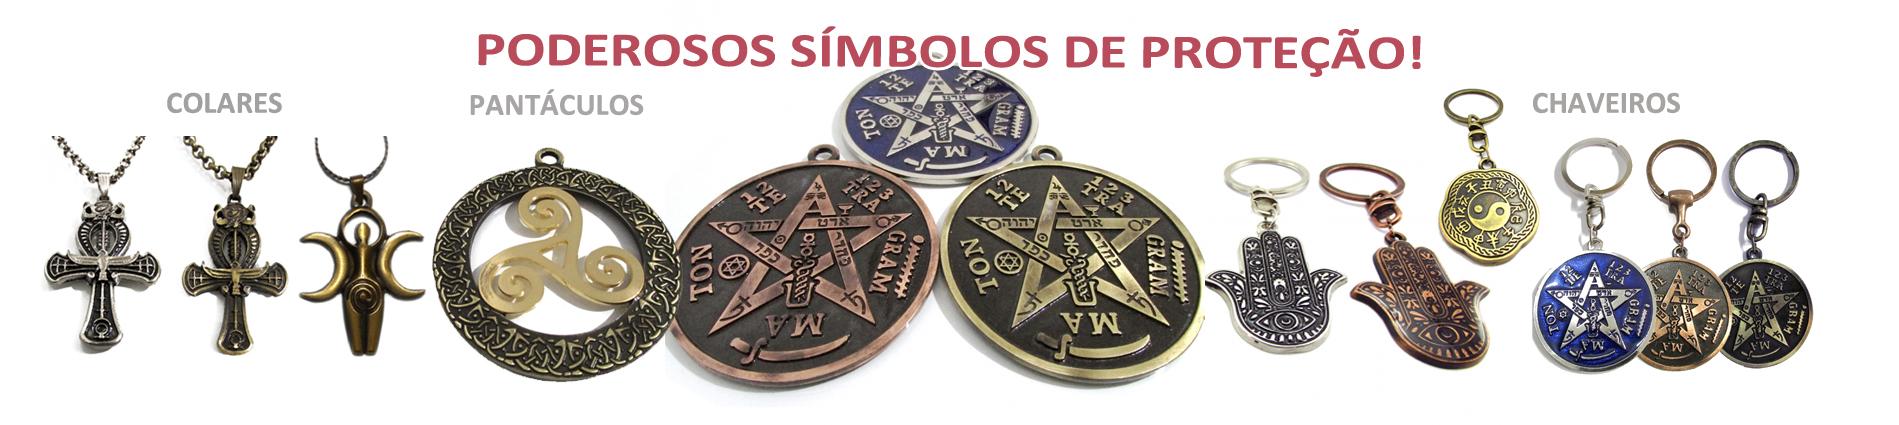 https://cdn.brasilesoterico.com/imagens_banners/ea5ef7321c1765cf14d092952b5460ed.jpg